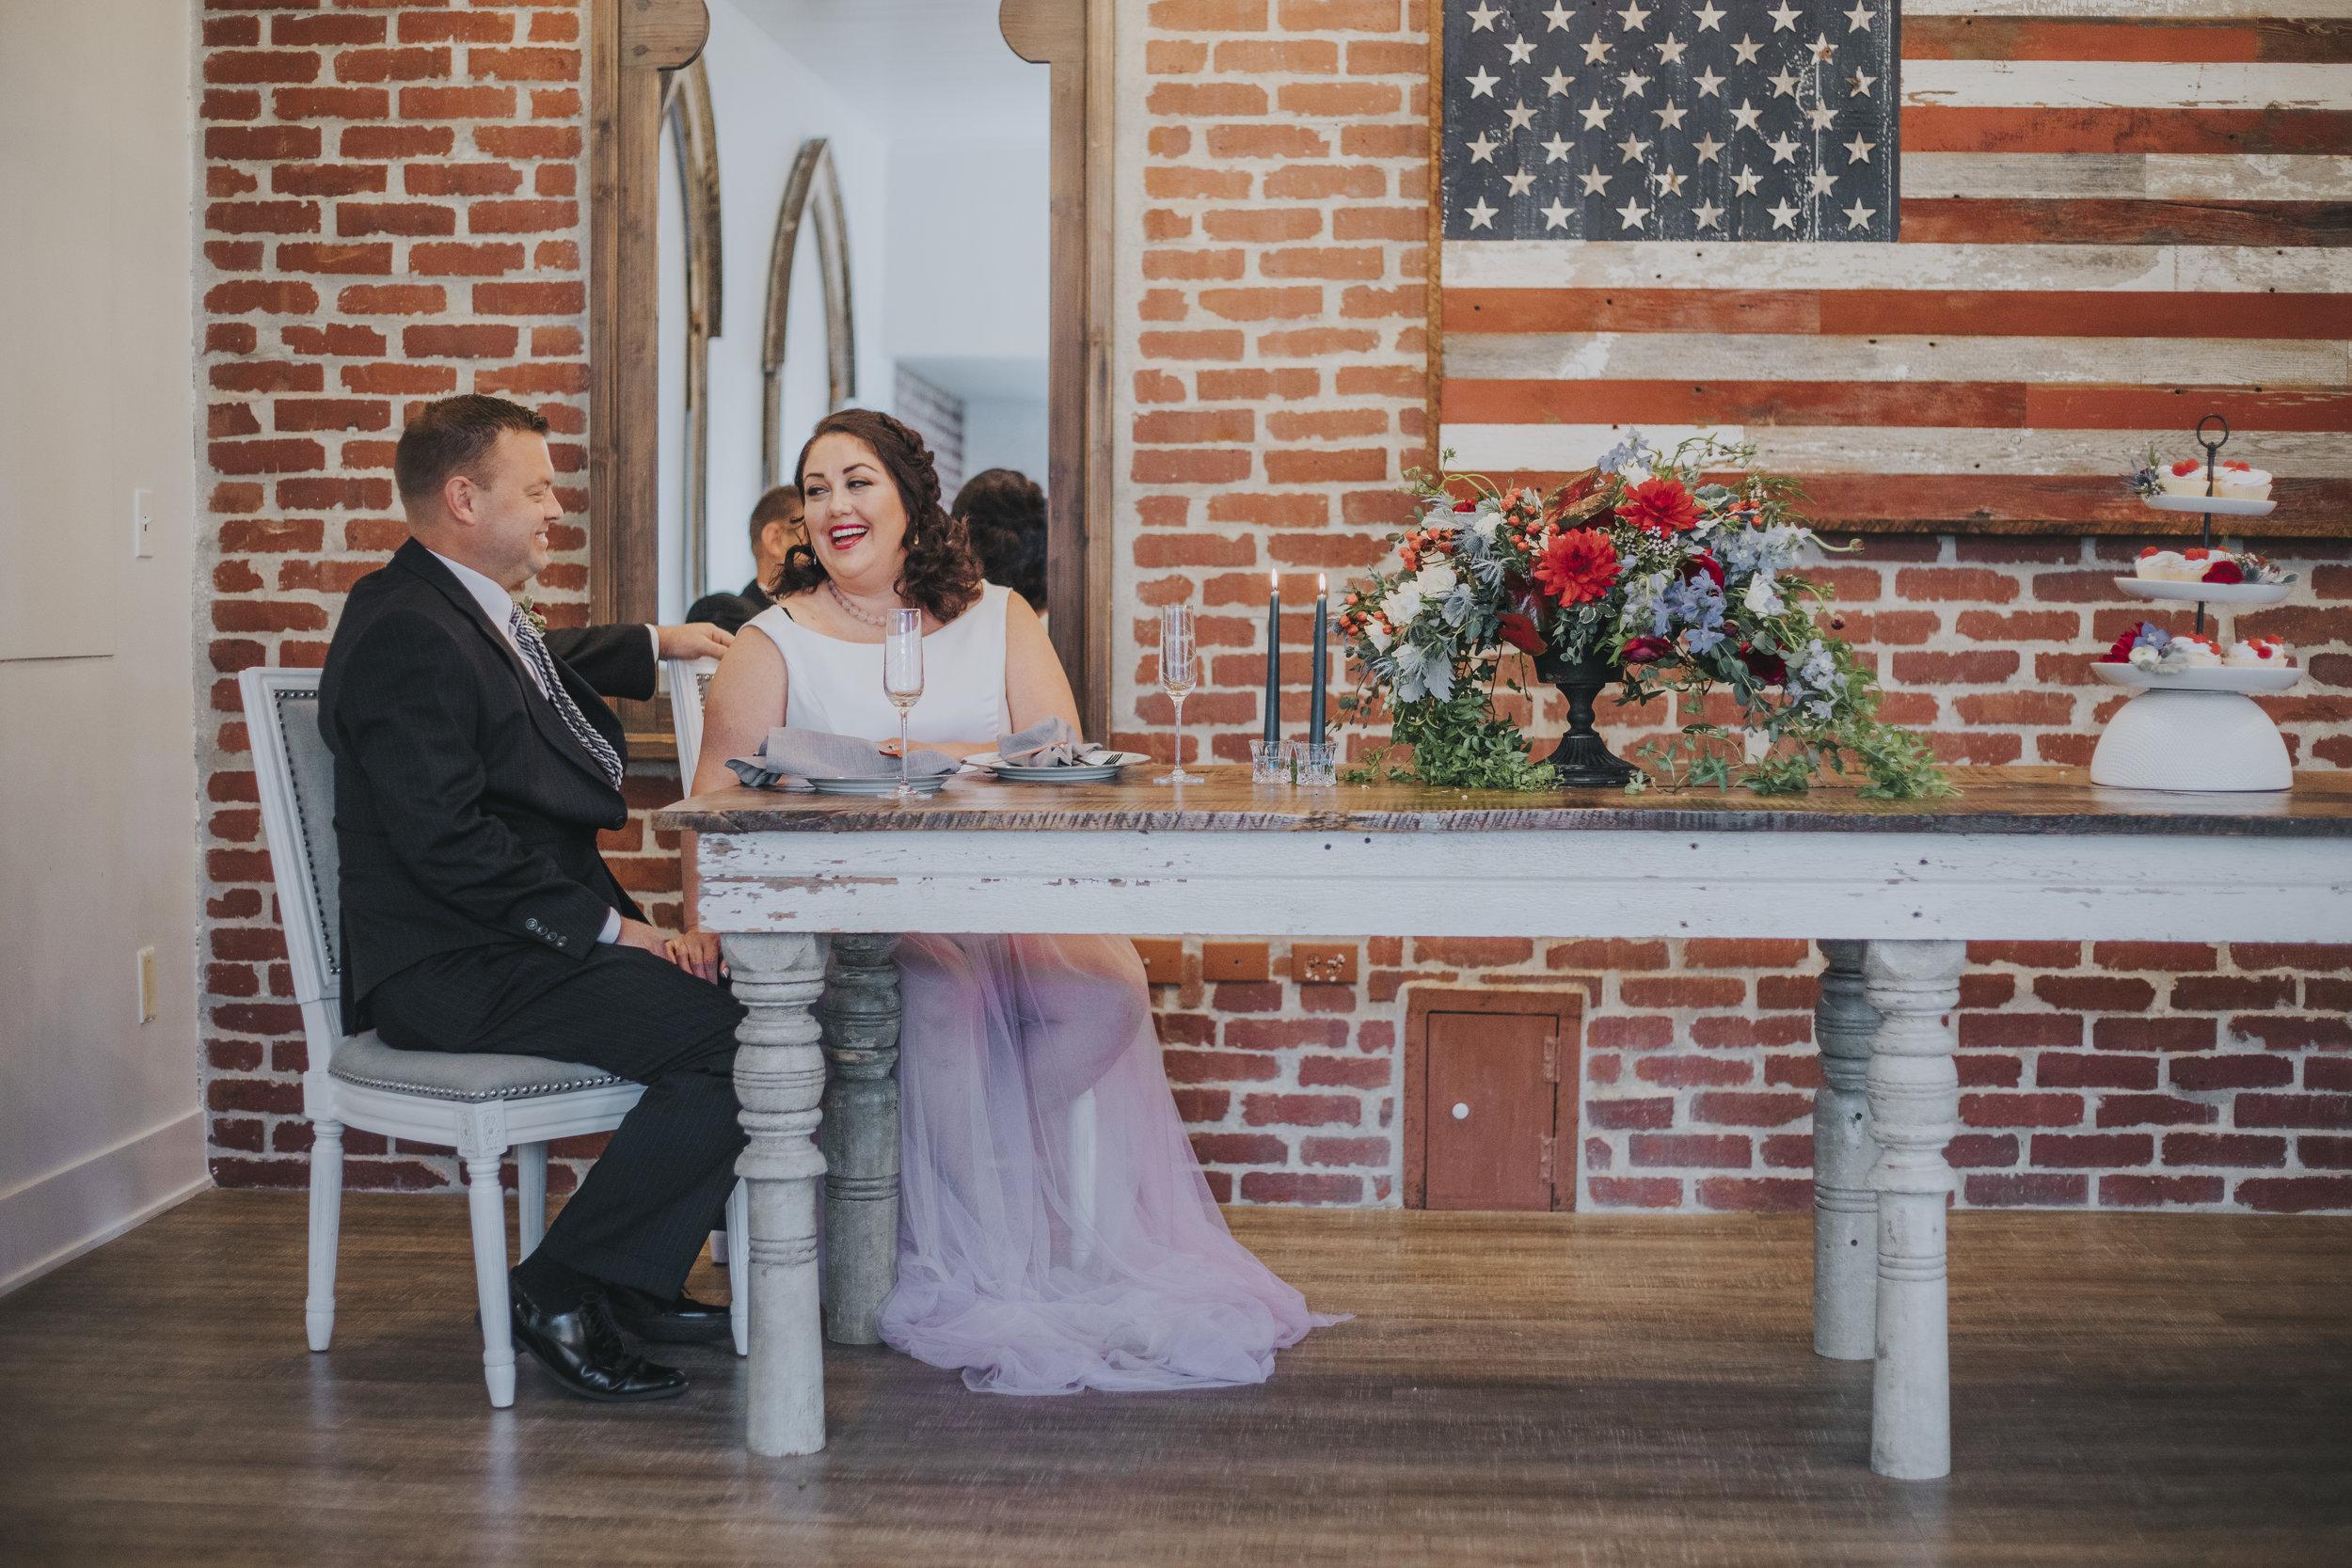 39 midwest-colorado-nebraska-elopement-photography-gretna-turtledoves.jpg